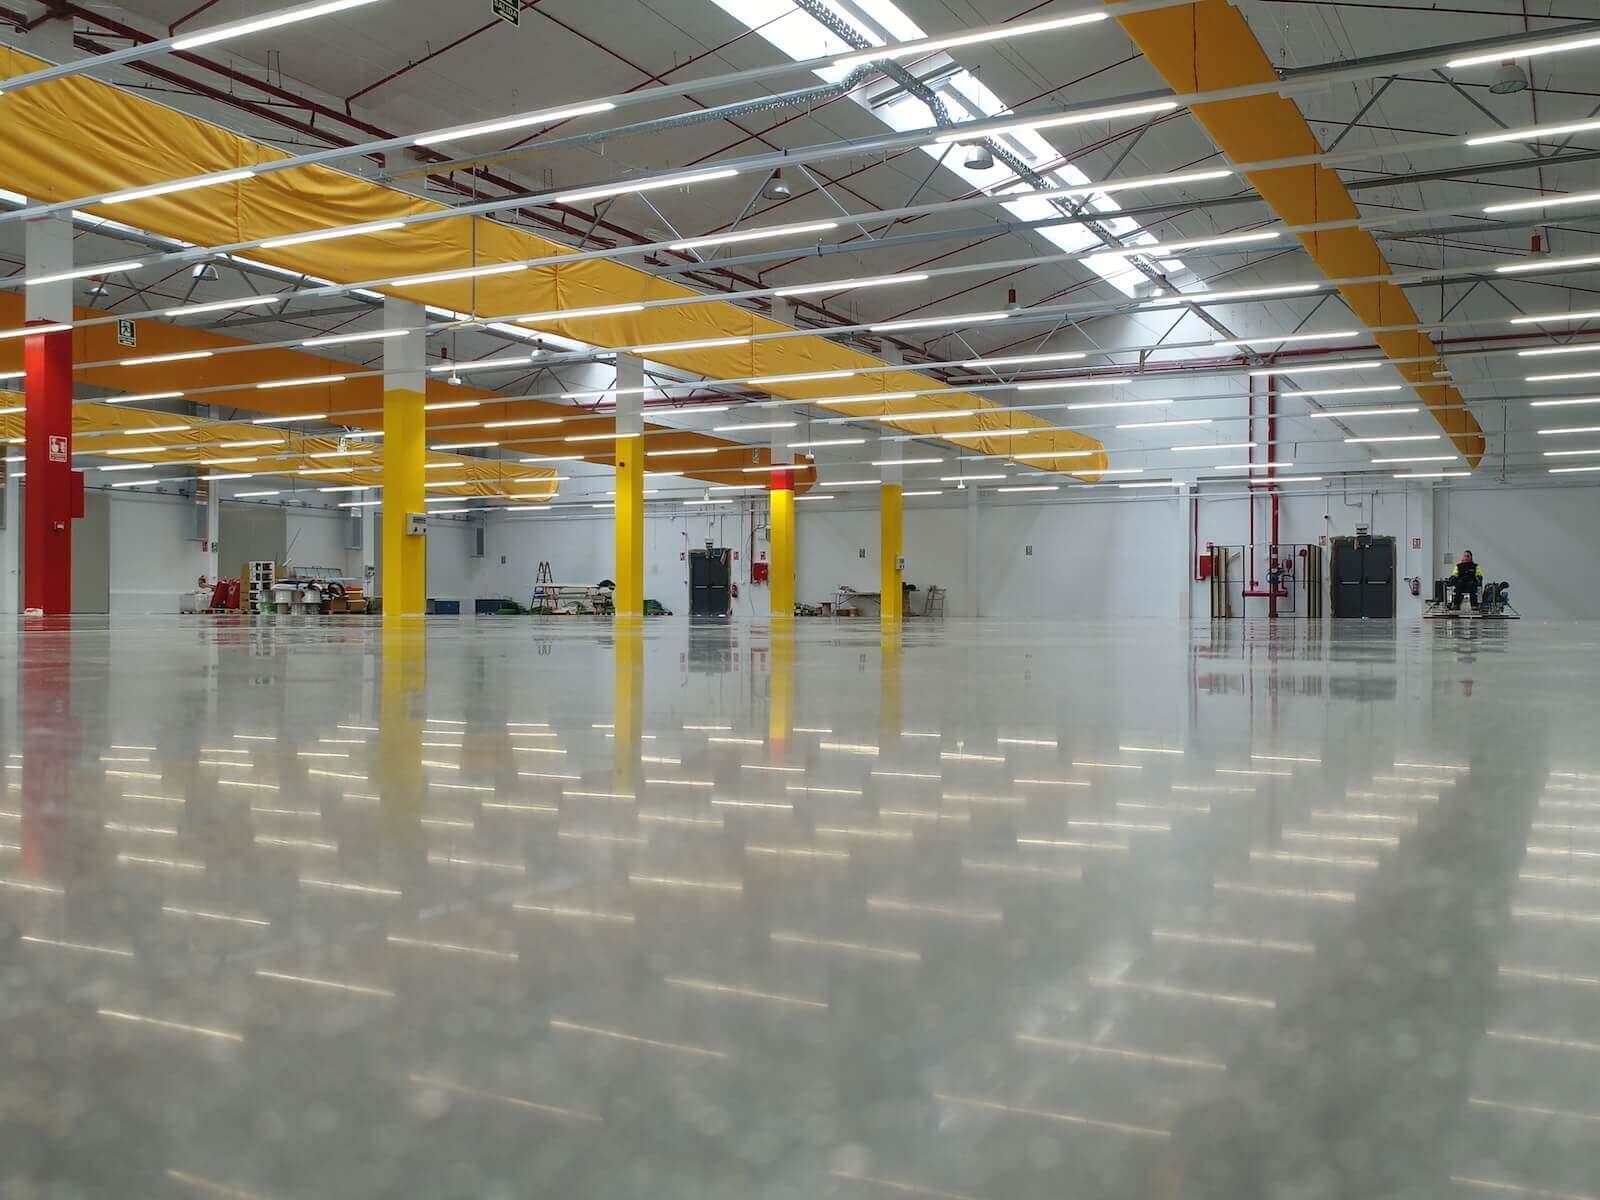 warehouse with shiny concrete